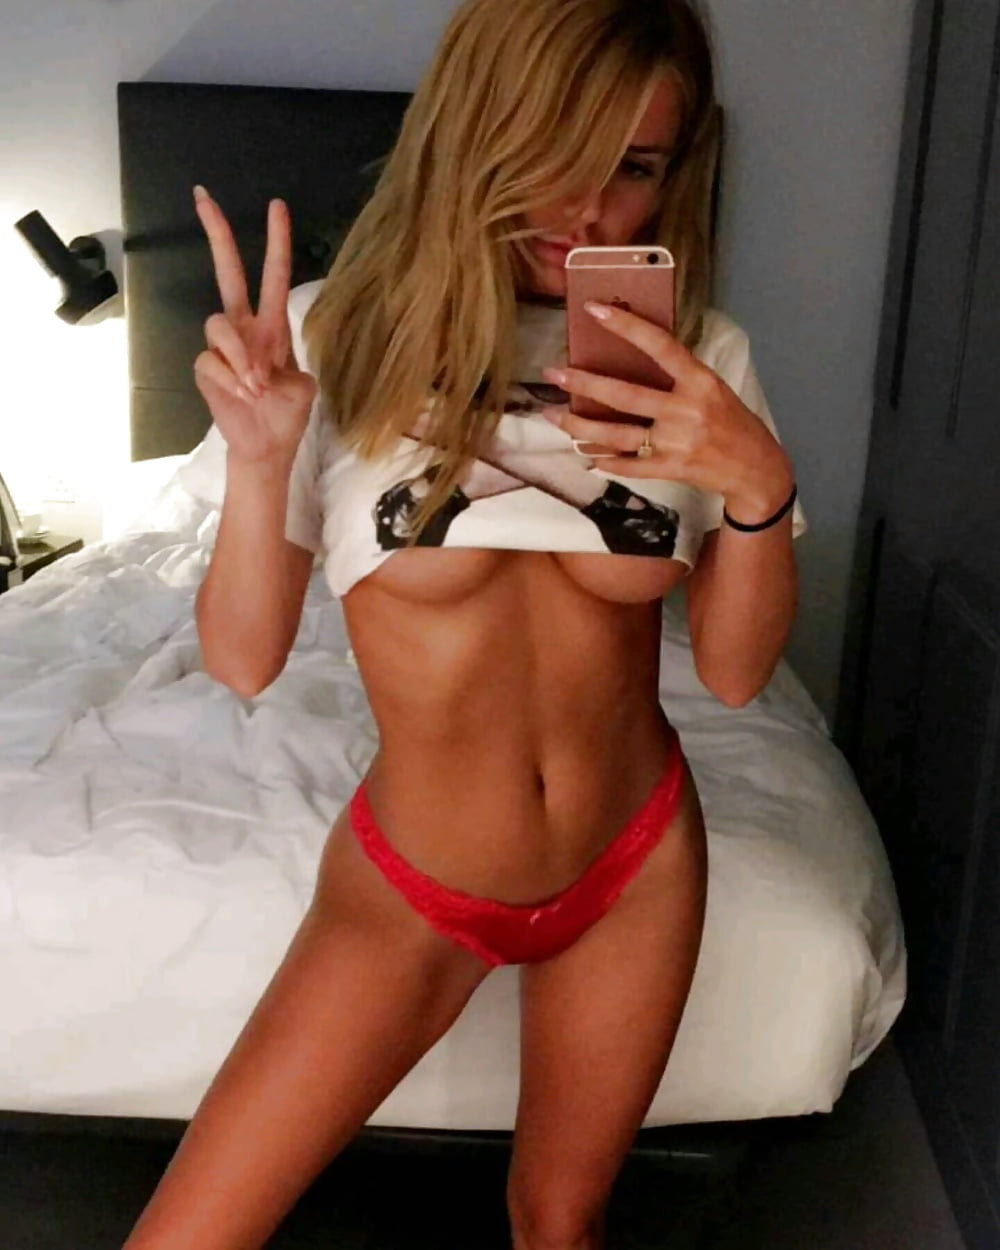 Amanda Lynn Porn see and save as amanda lynn porn pict - 4crot